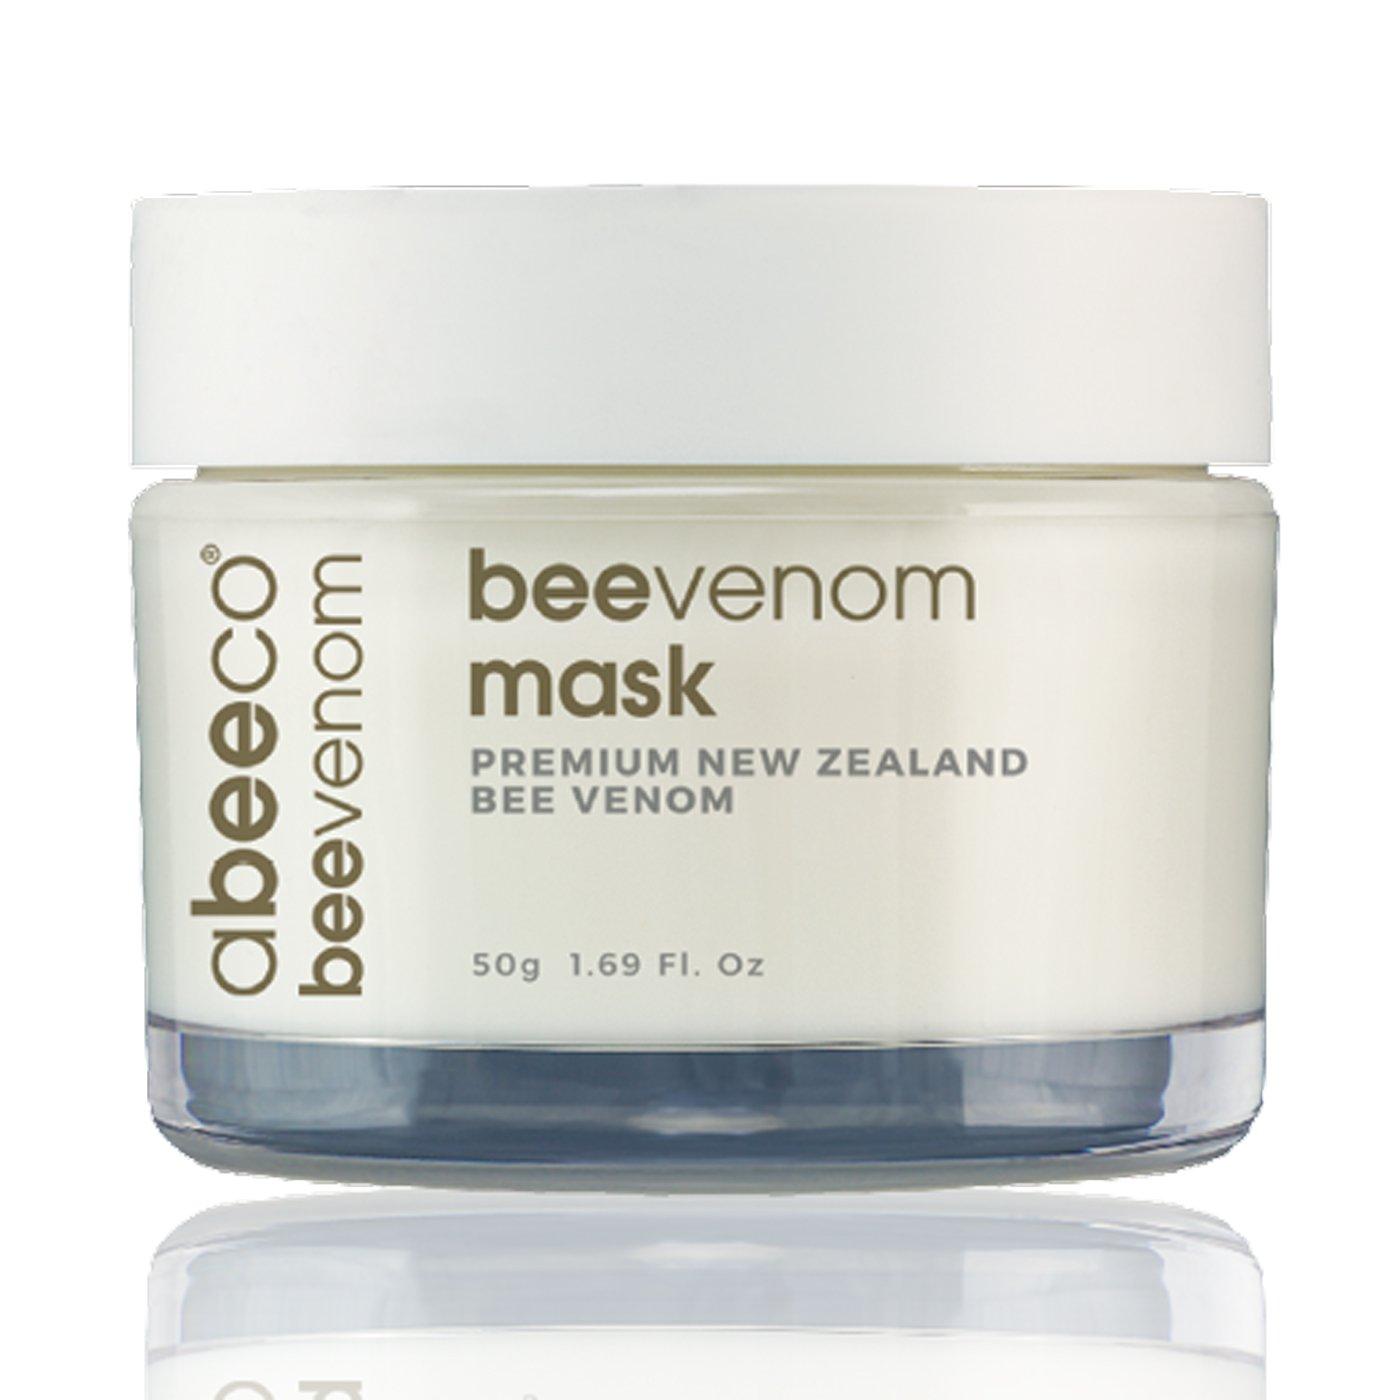 Abeeco Pure New Zealand Bee Venom Mask, 1 69 fl oz (50g)